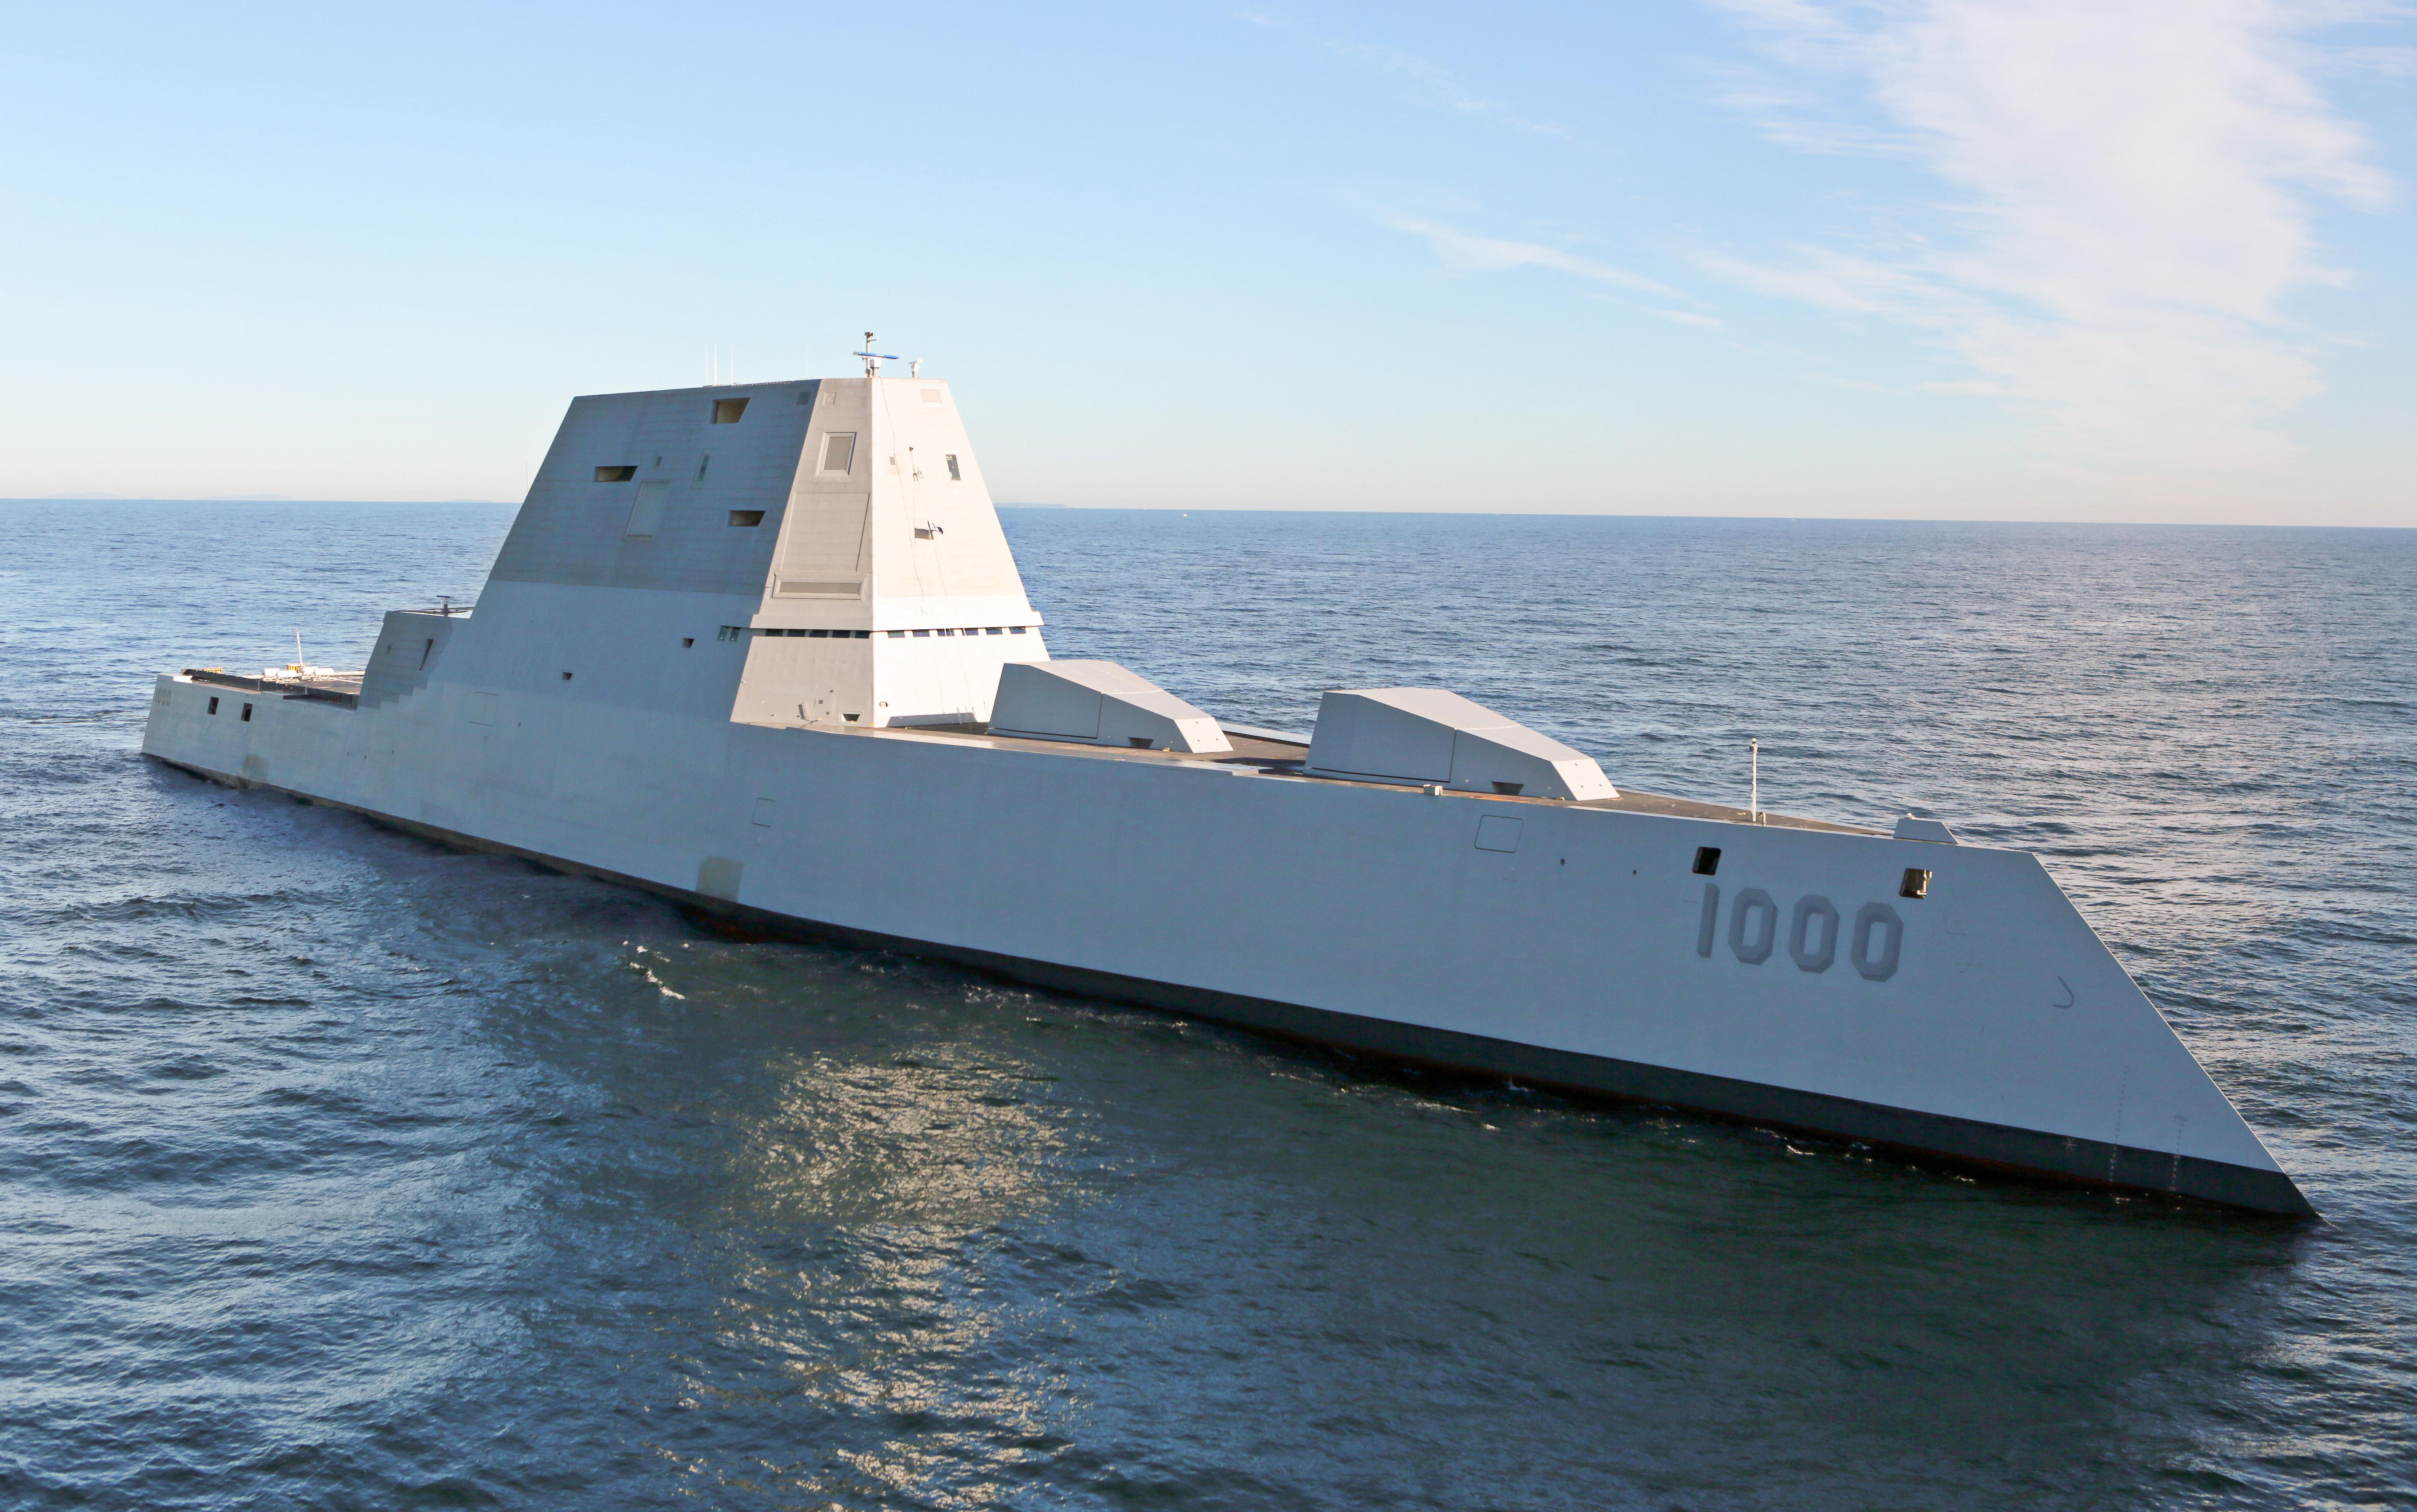 Zumwalt class destroyer Wikipedia